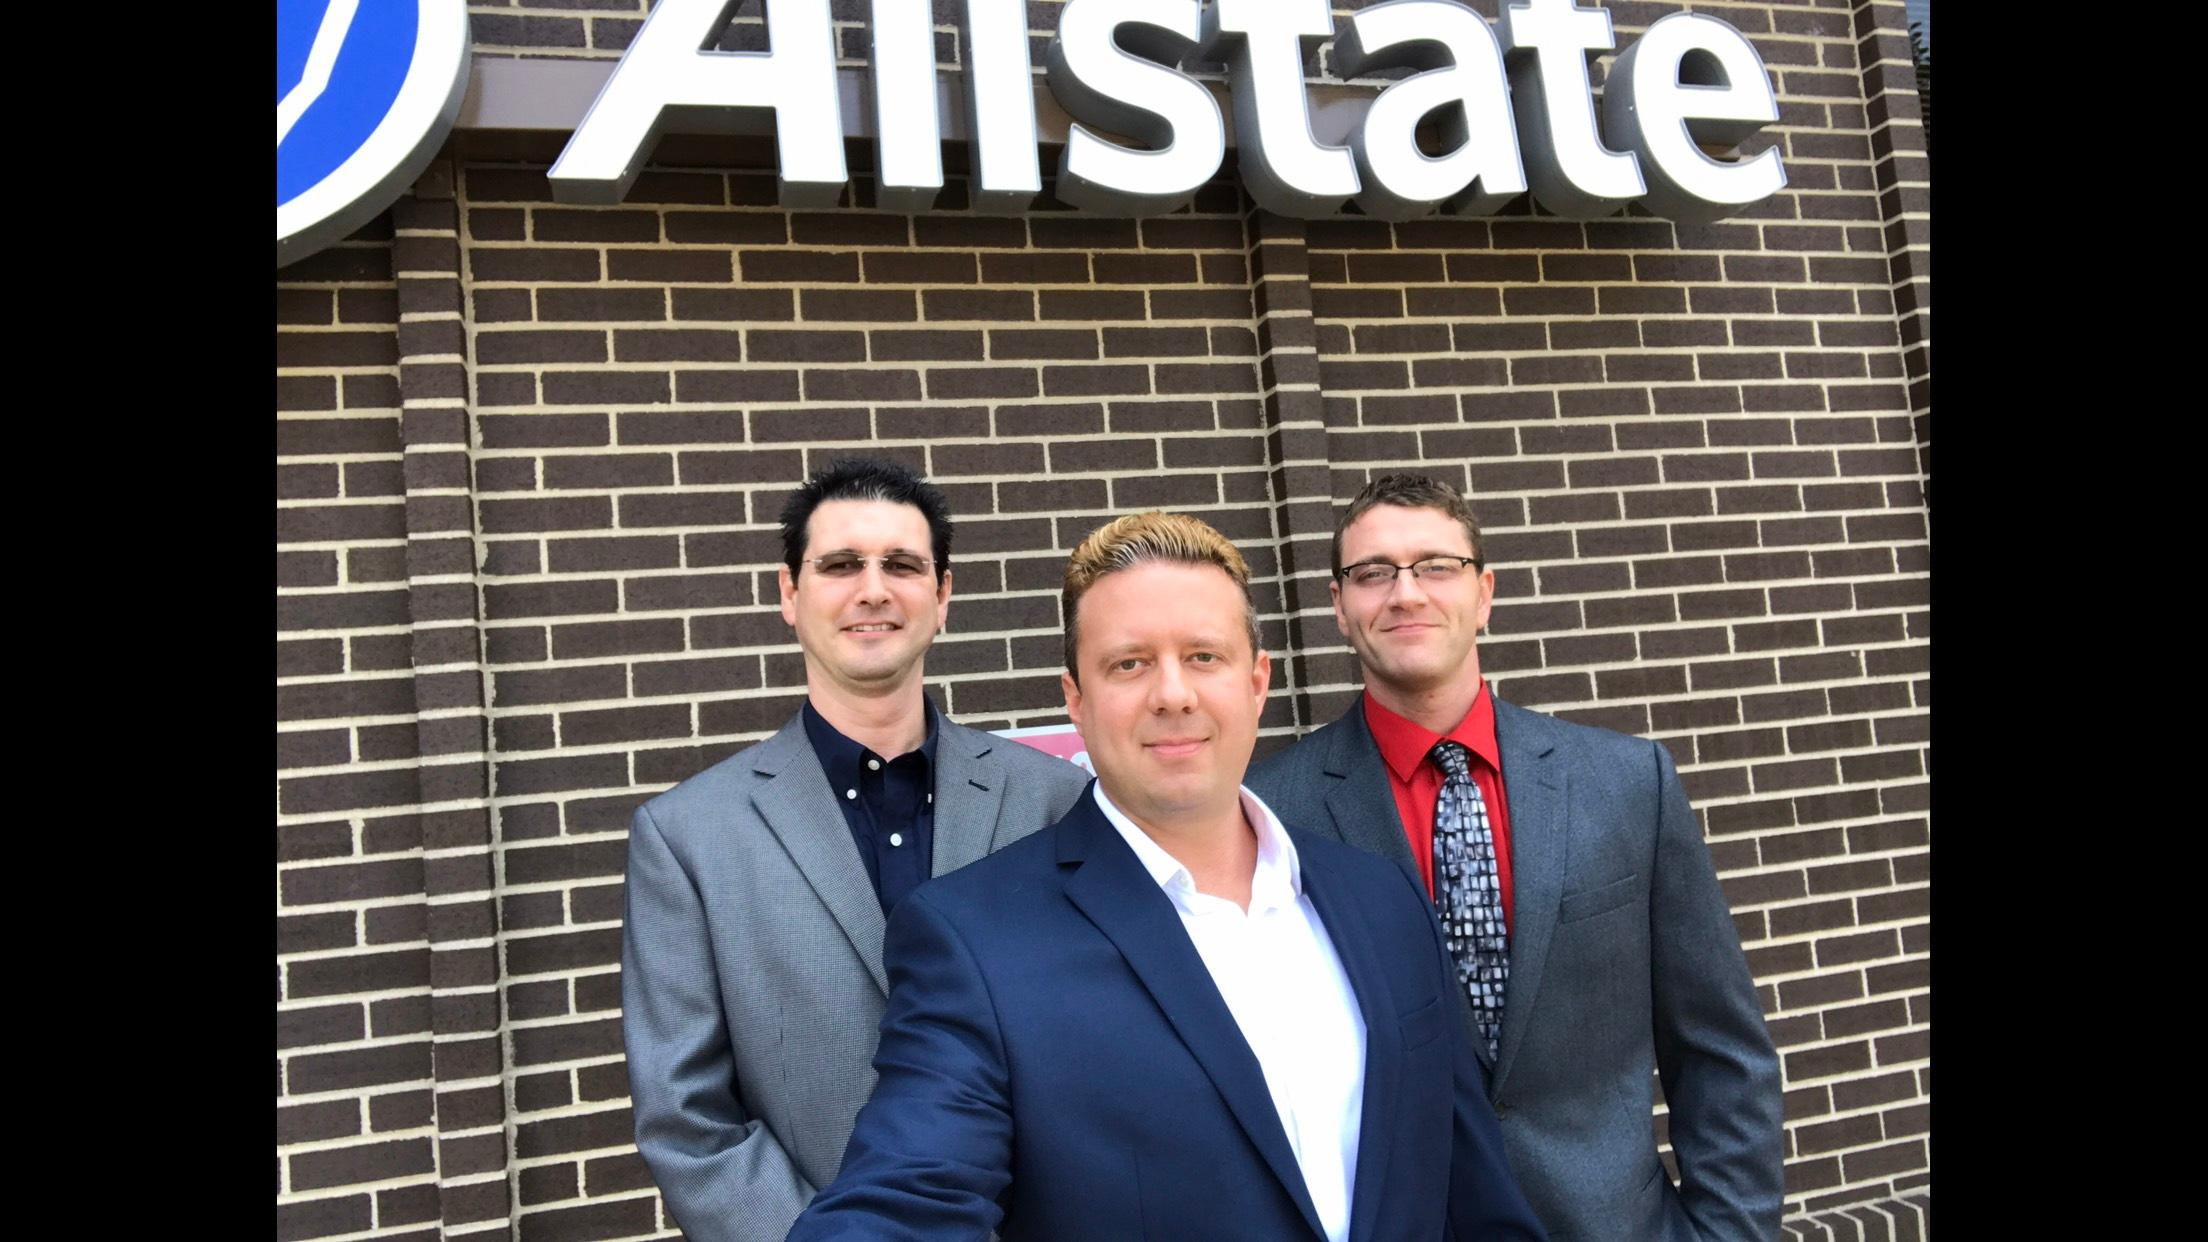 Matt Curtis: Allstate Insurance image 0